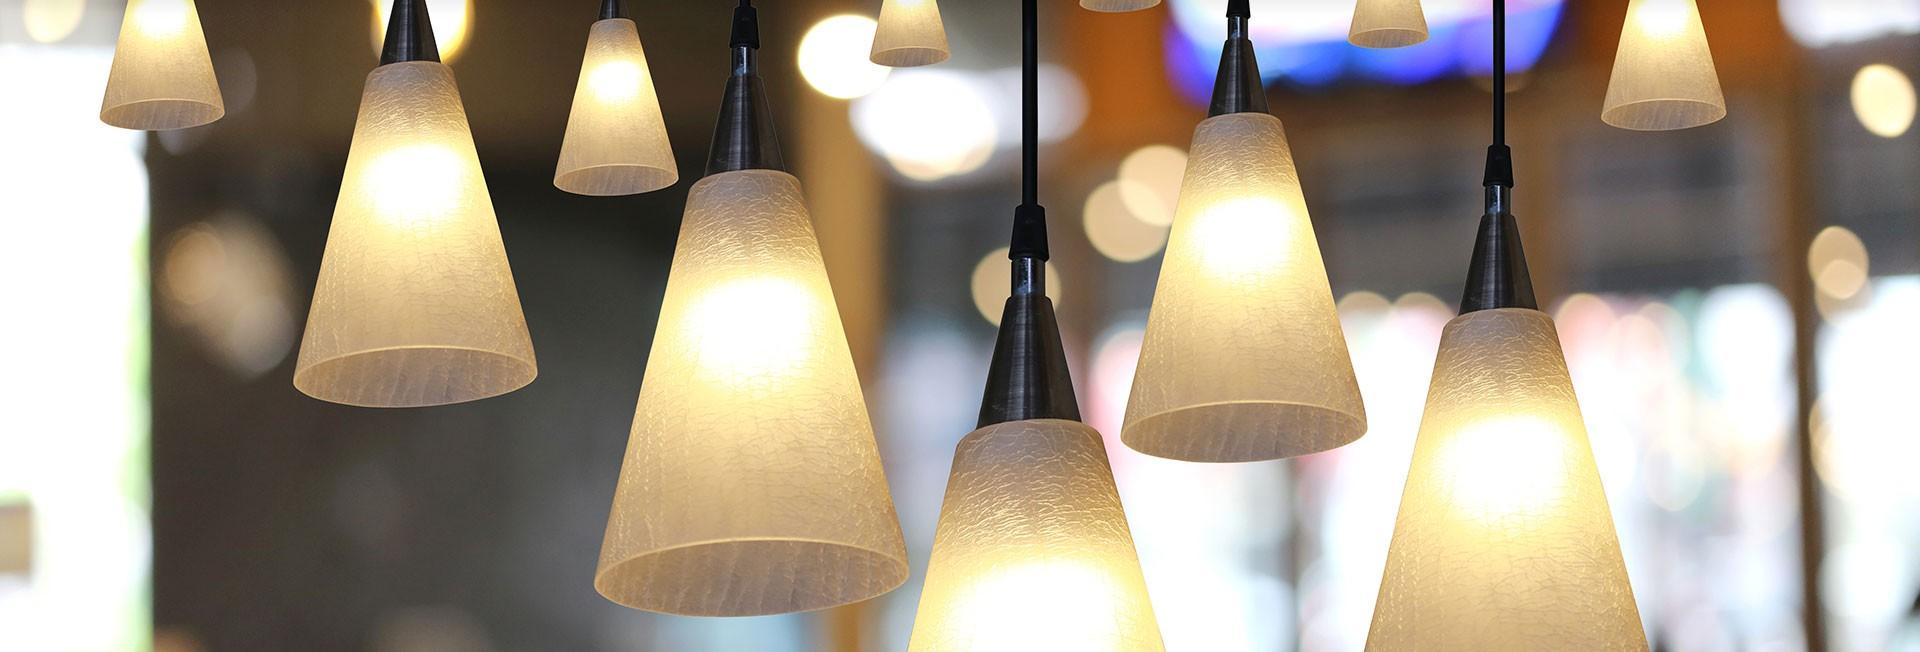 Ampopules-LEDs-2.jpg